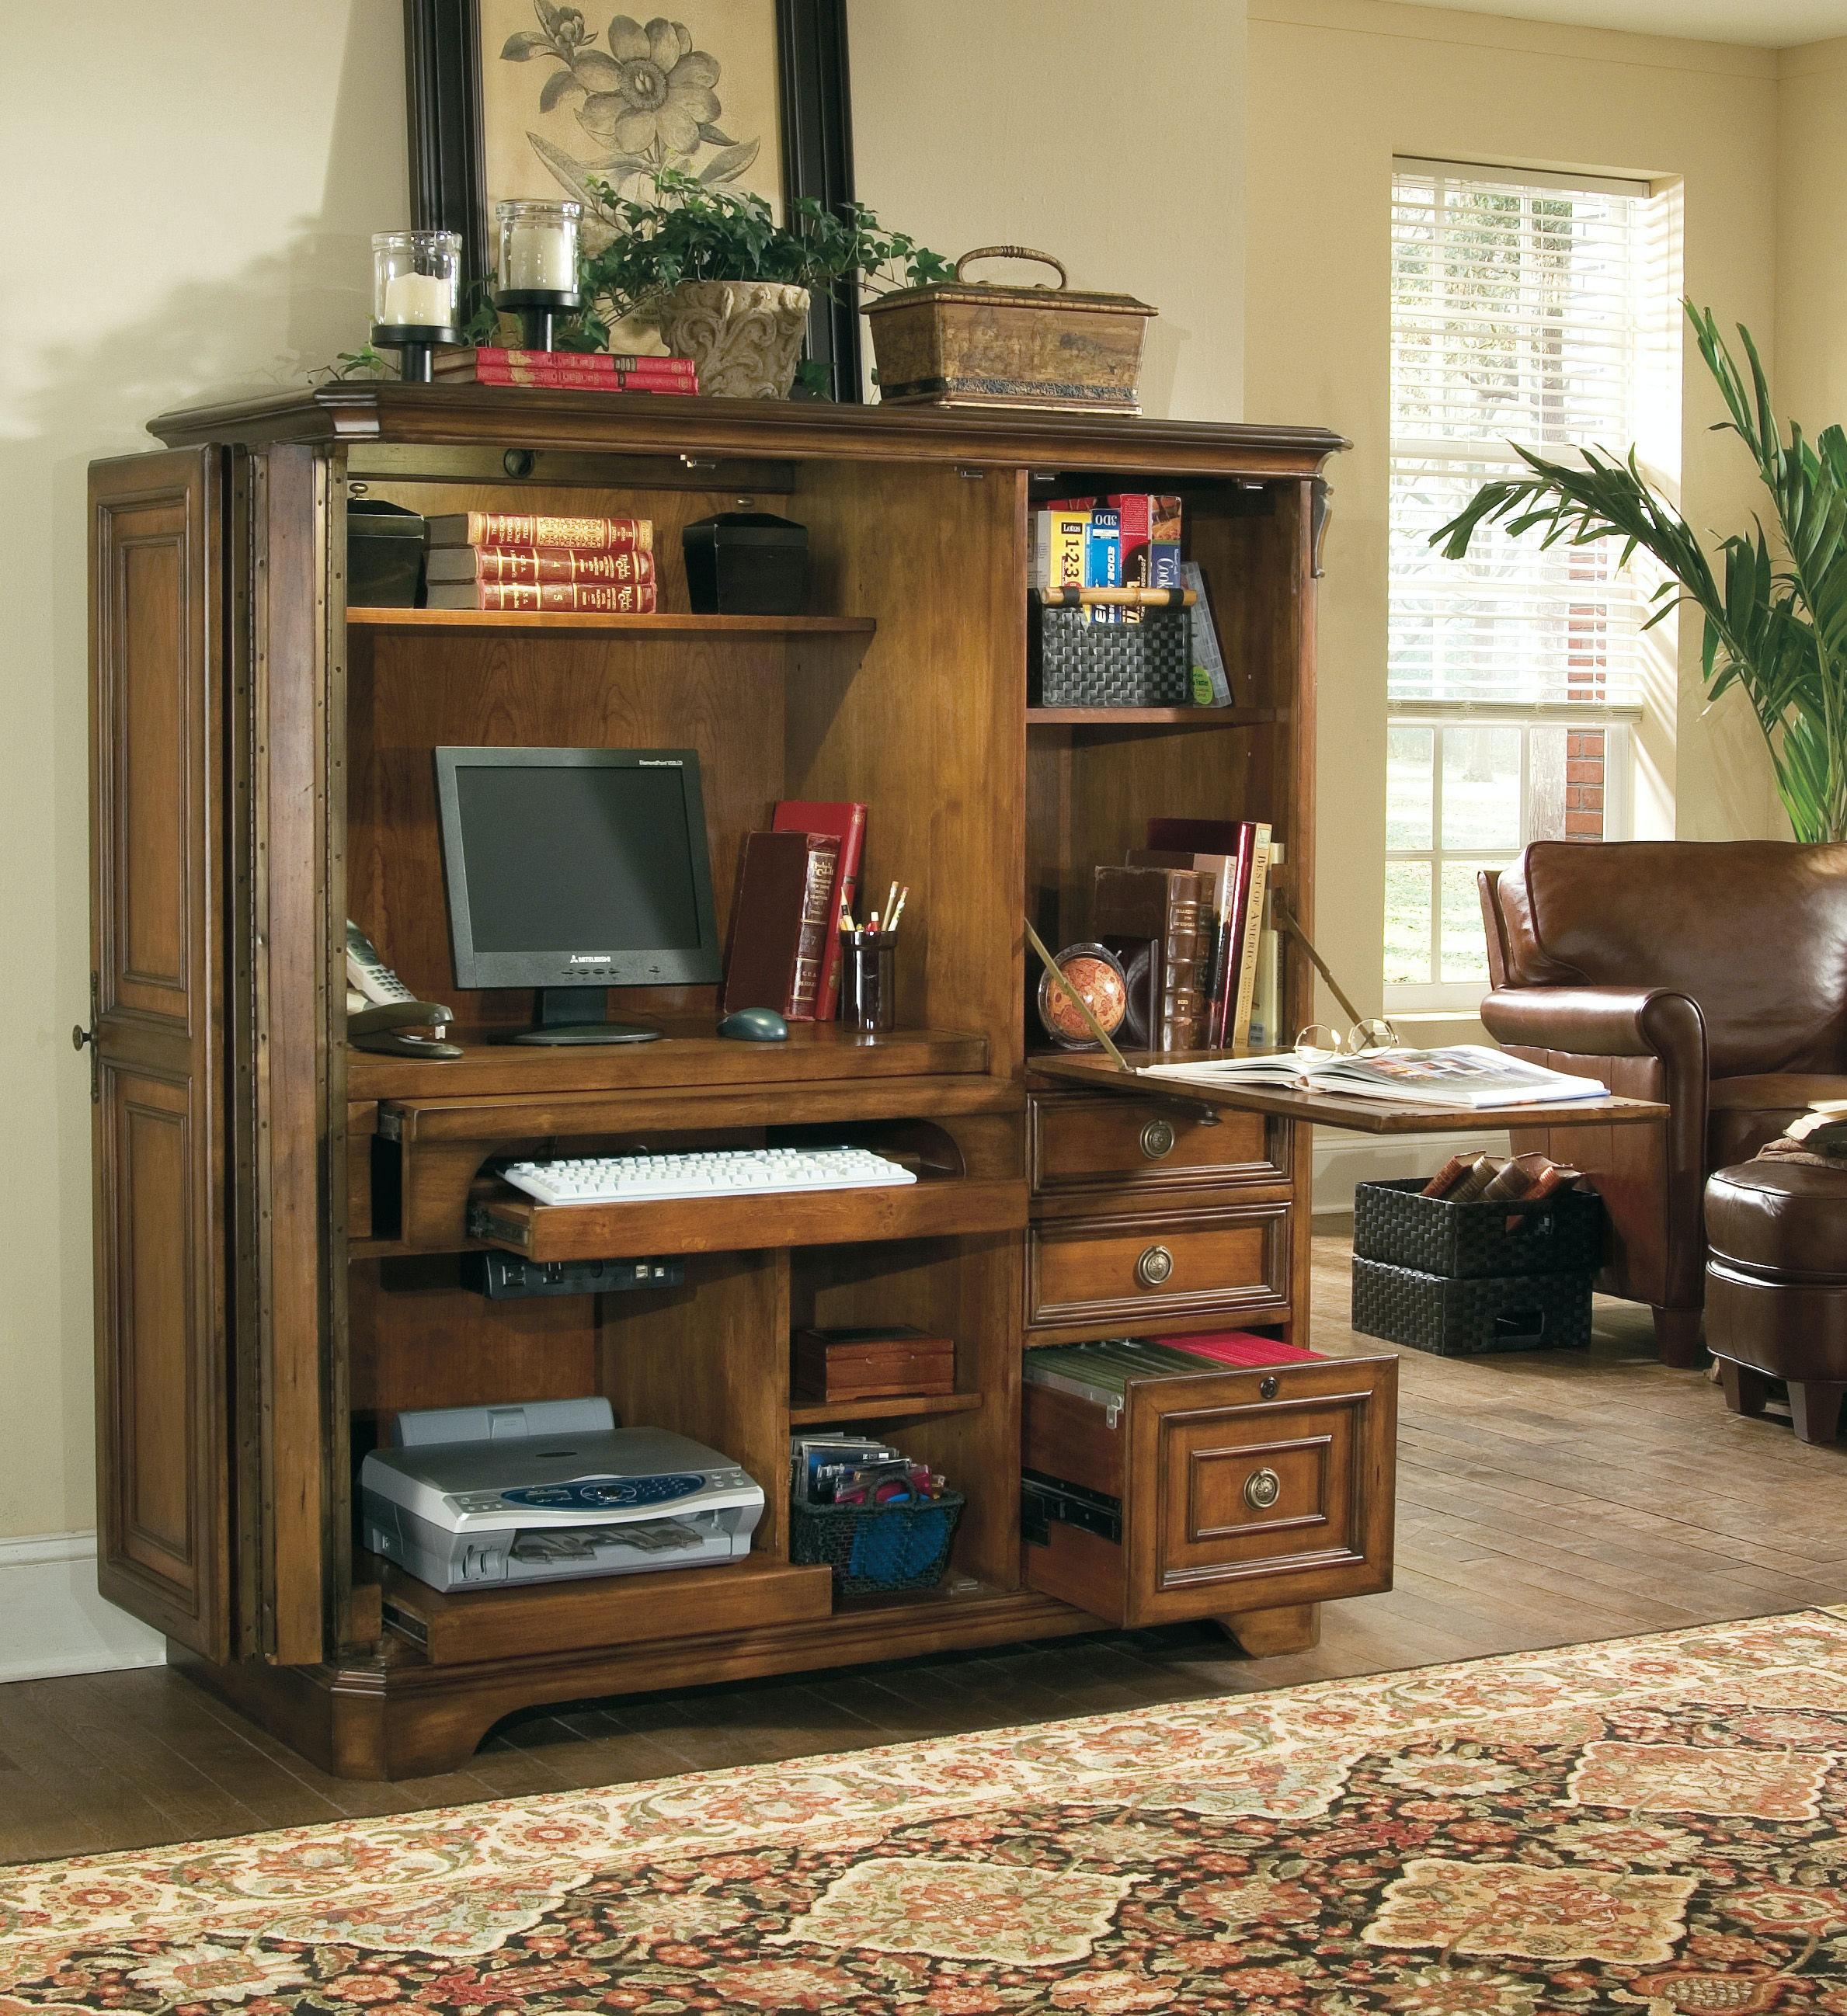 Hooker Furniture Home Office Brookhaven Computer Cabinet 281-10 ...